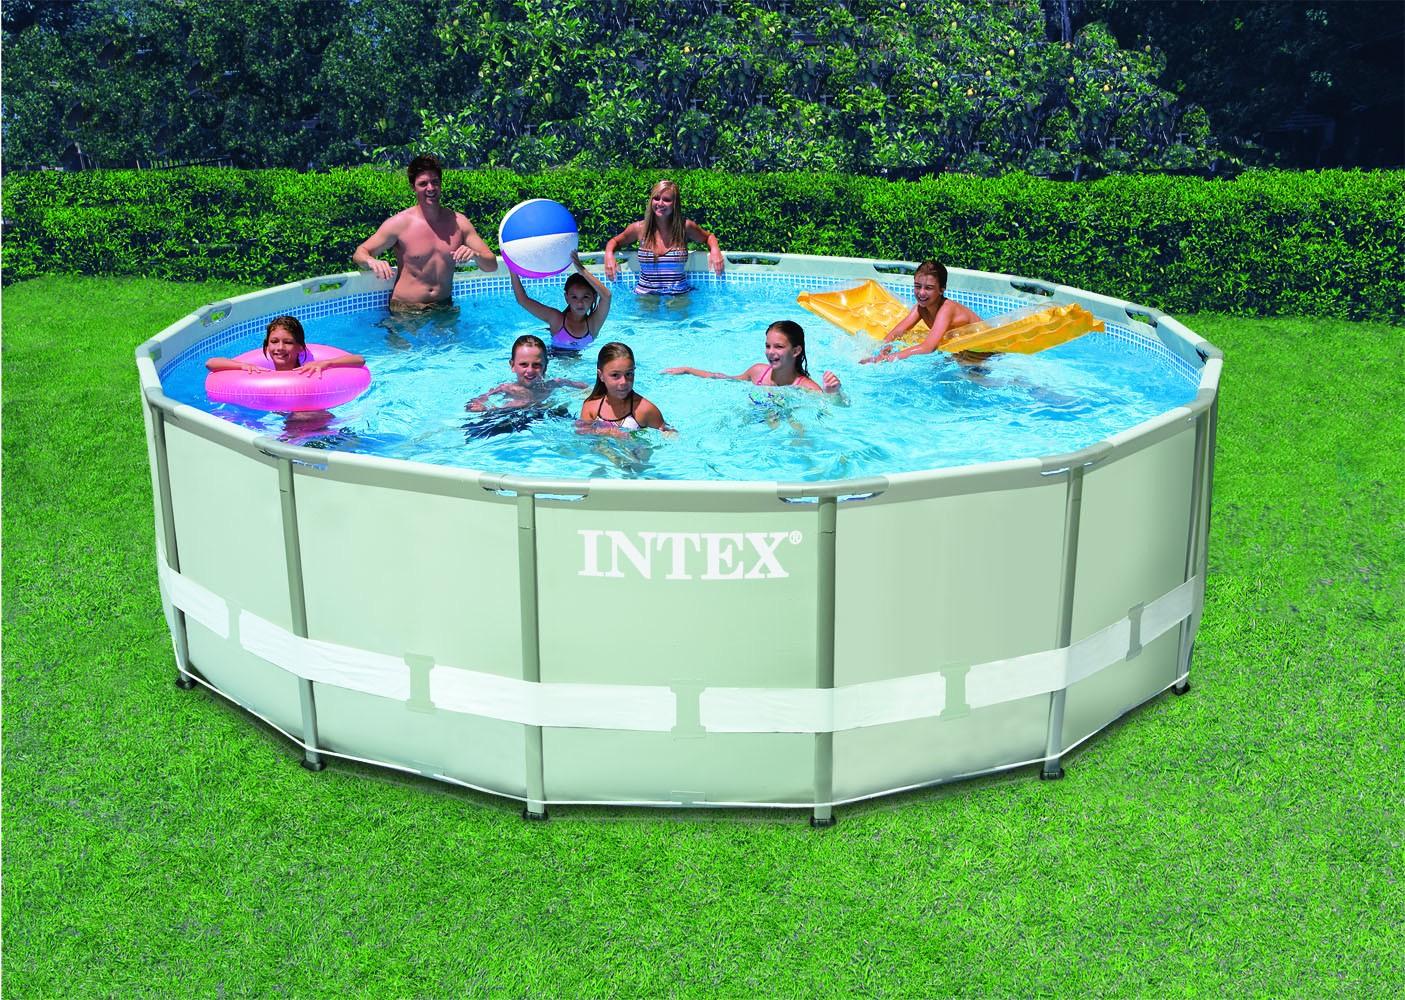 Intex ultra frame pool 427x107 cm set met filterpomp for Filterpomp zwembad